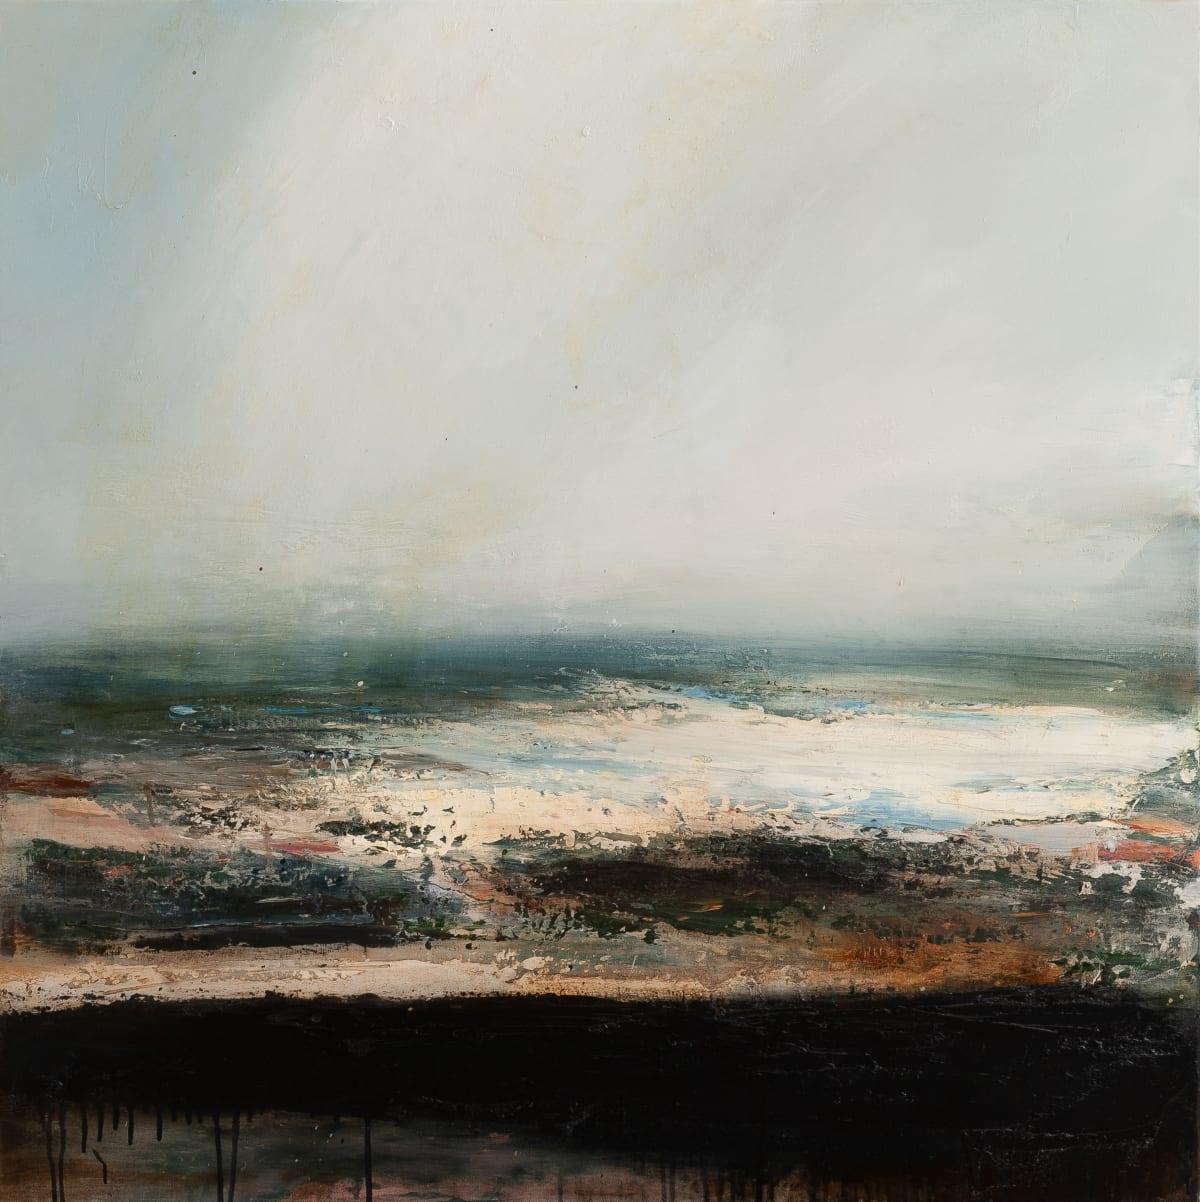 Dion Salvador Lloyd Skylight, 2019 Oil on Canvas 105 x 105 x 5 cm 41 3/8 x 41 3/8 x 2 in